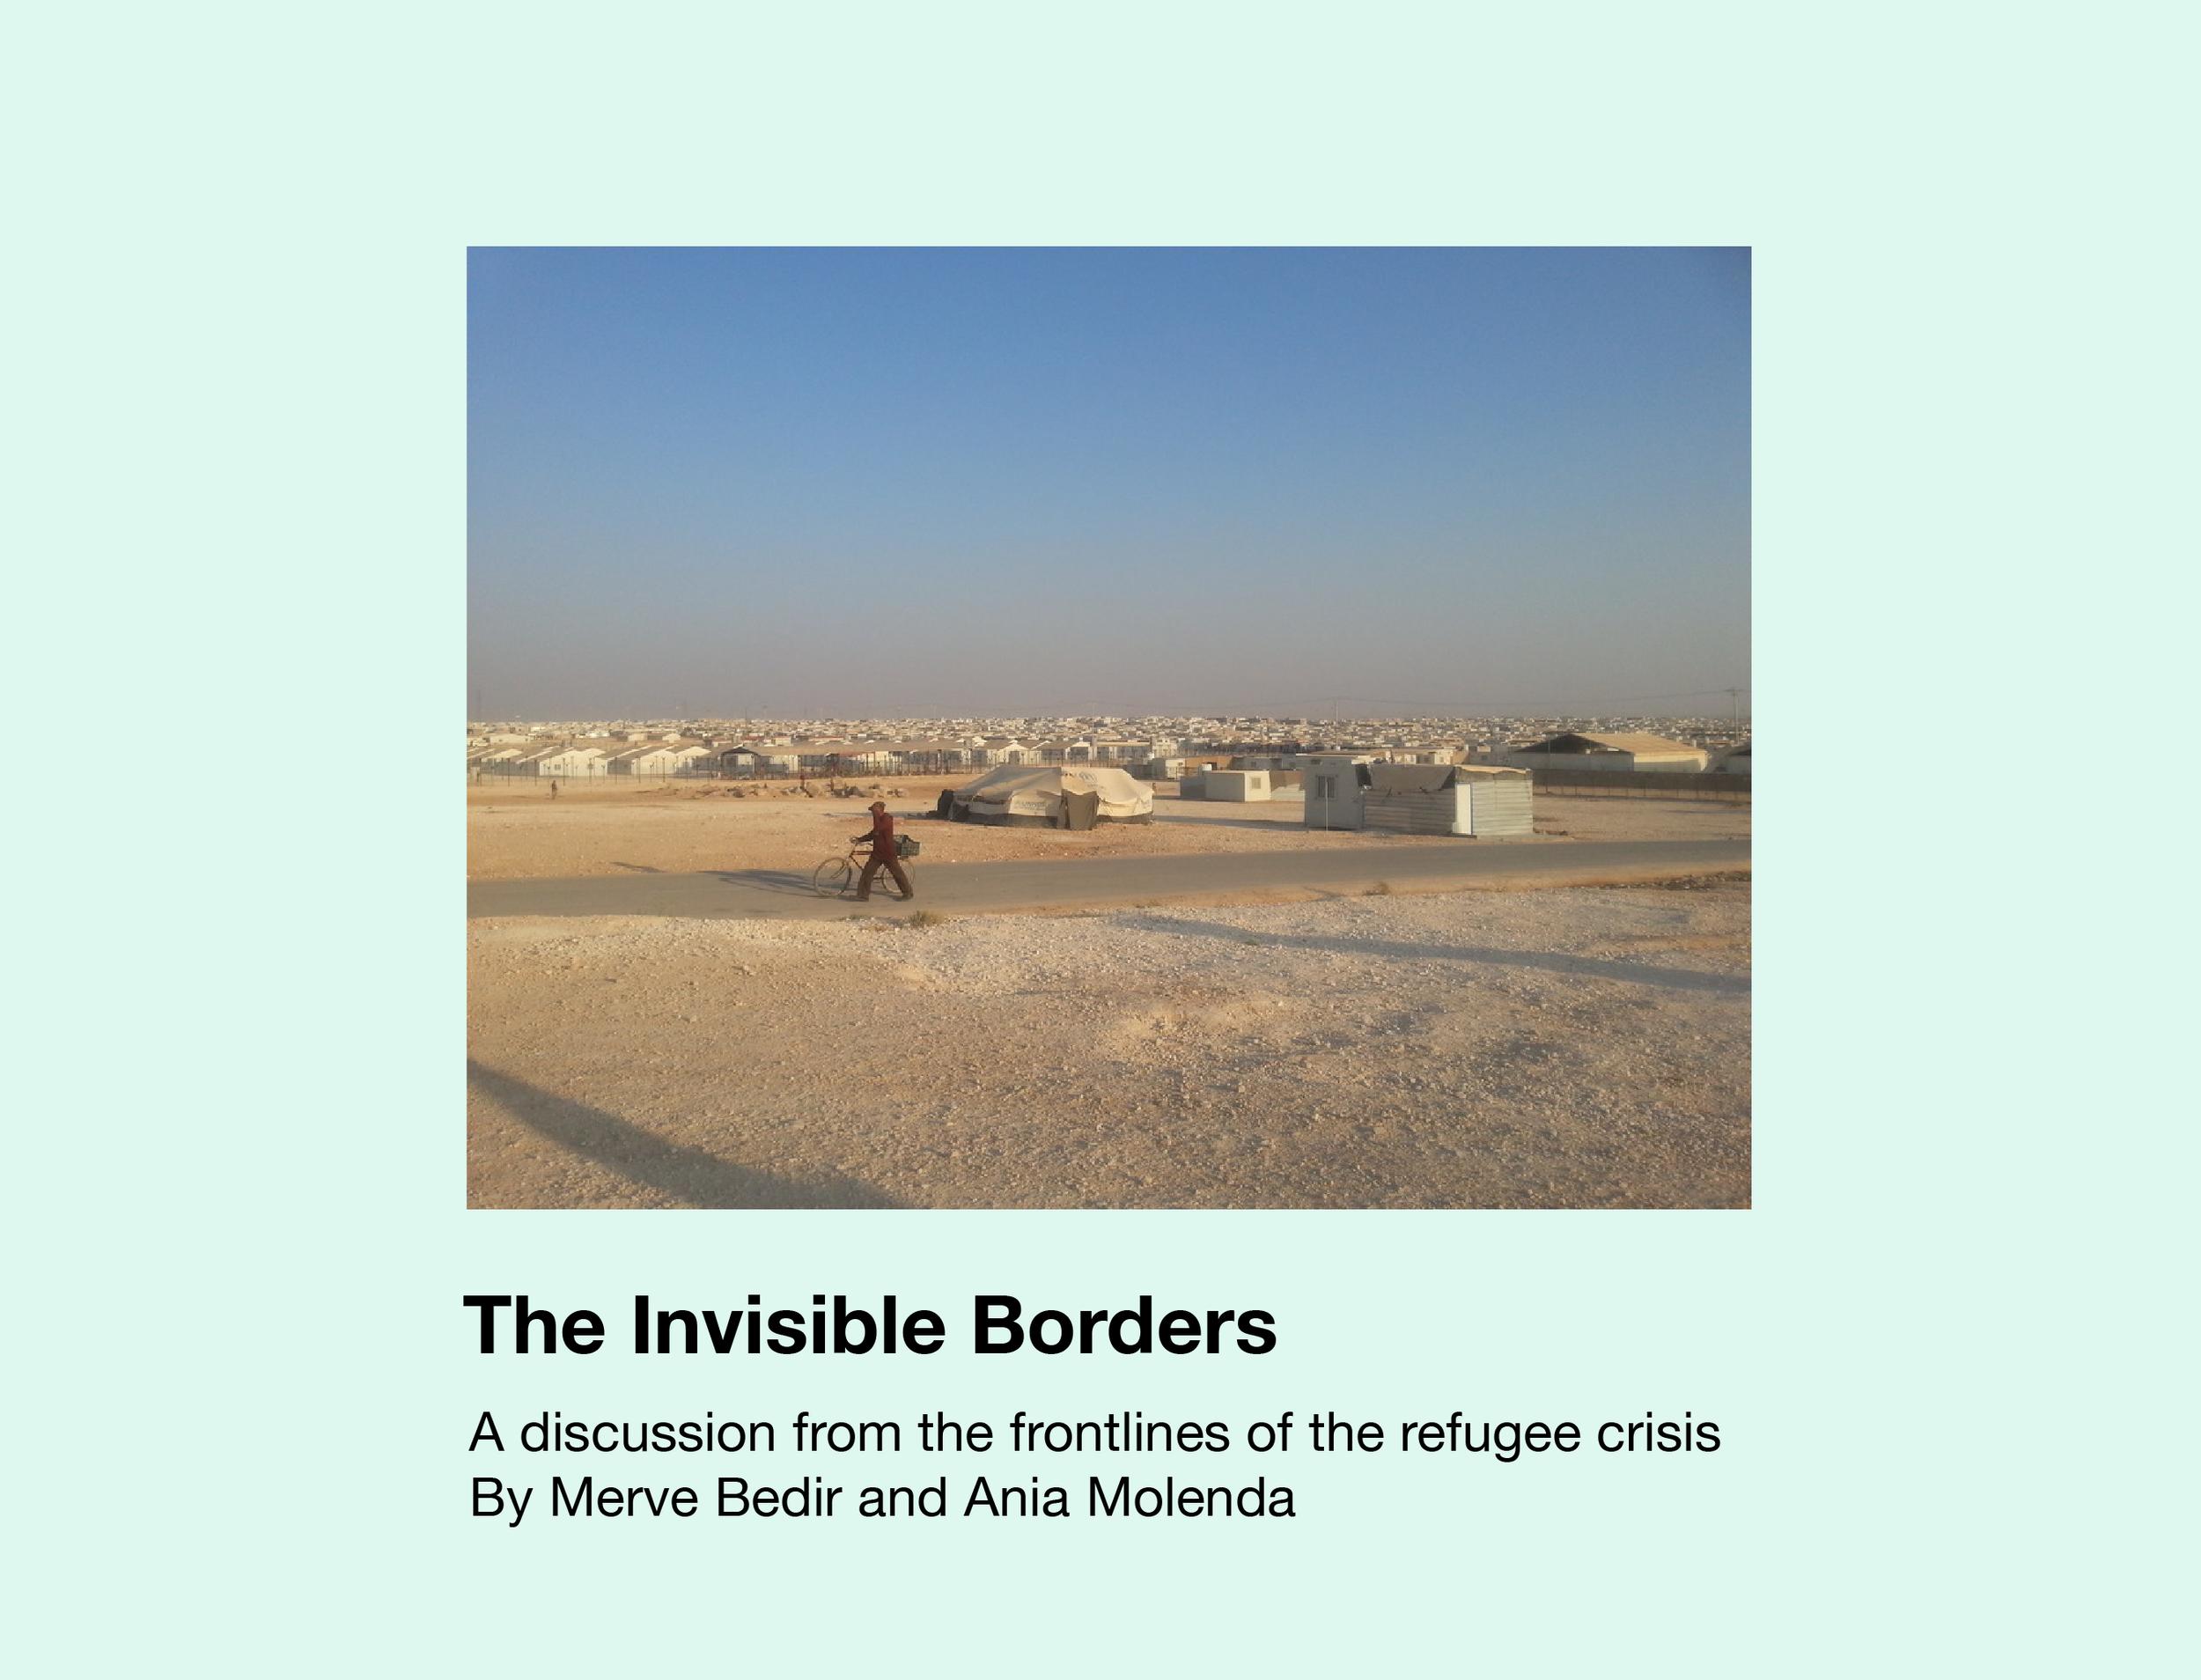 borders blog highlihgts-27.png